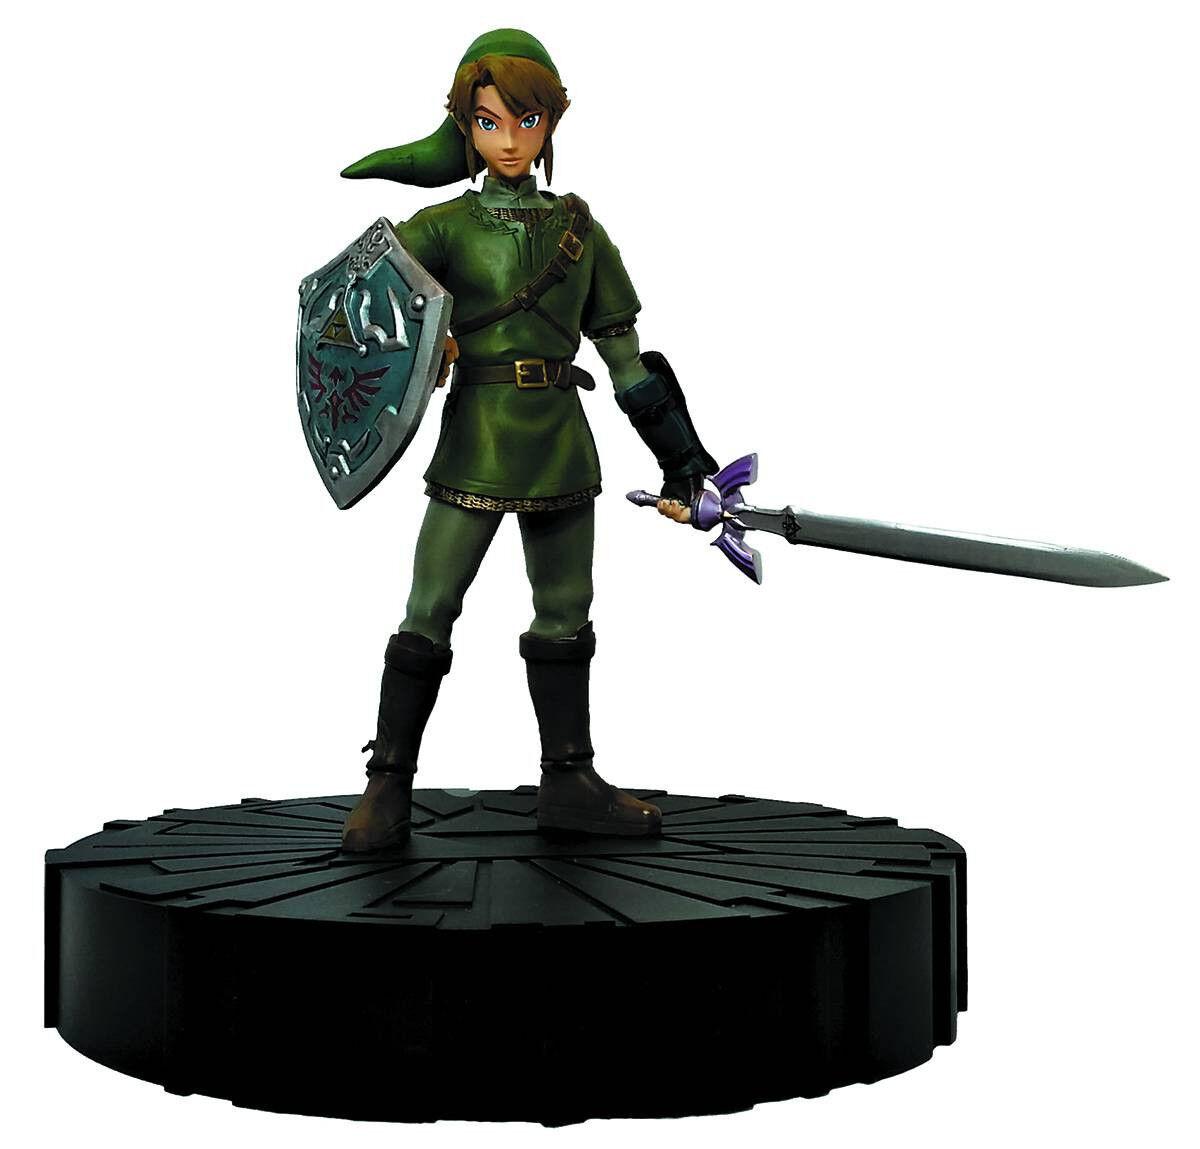 Legend of Zelda Twilight Princess Link 10